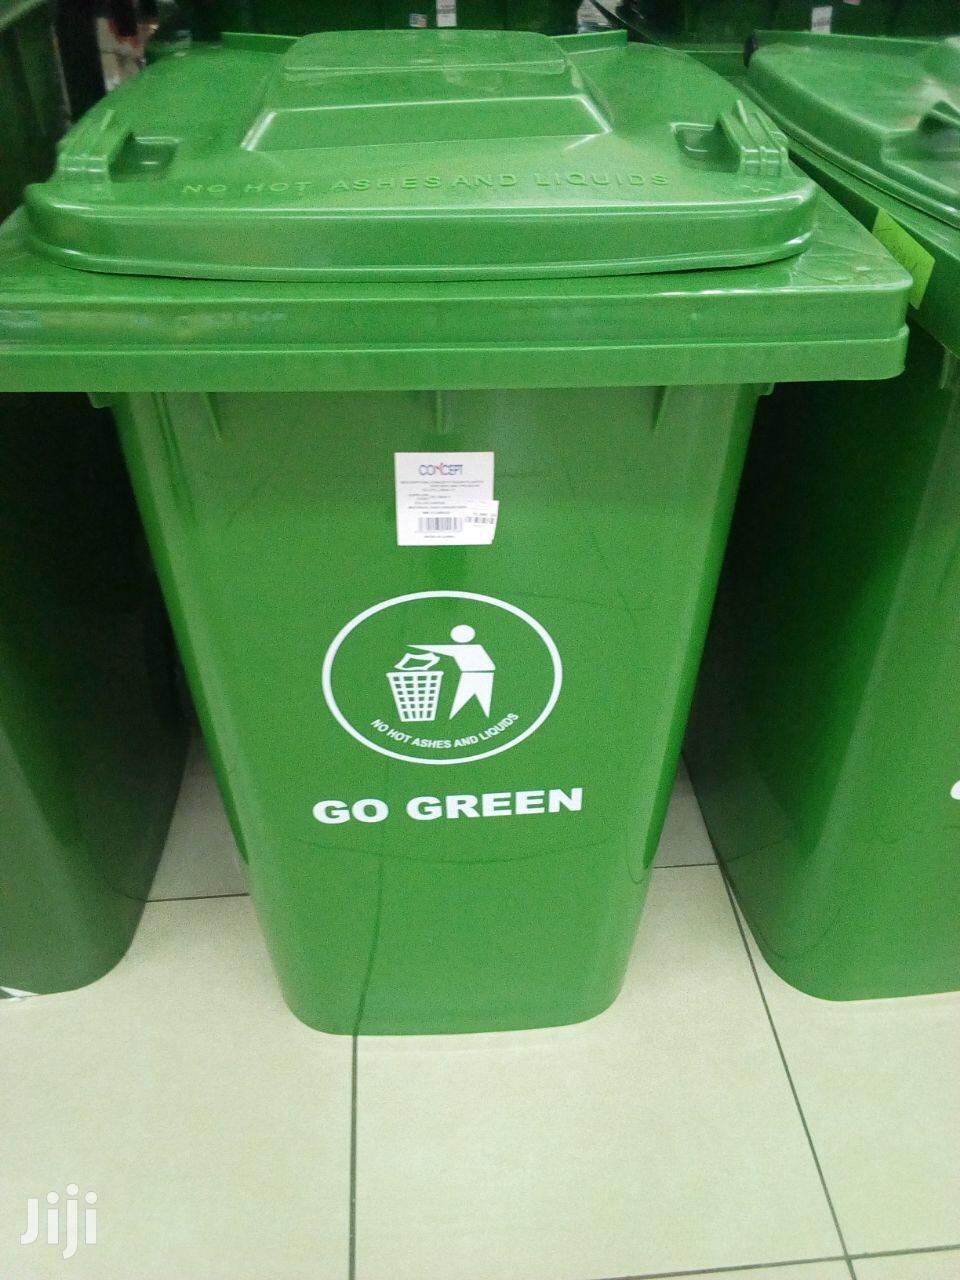 Movable Litter Bins | Home Accessories for sale in Westlands, Nairobi, Kenya